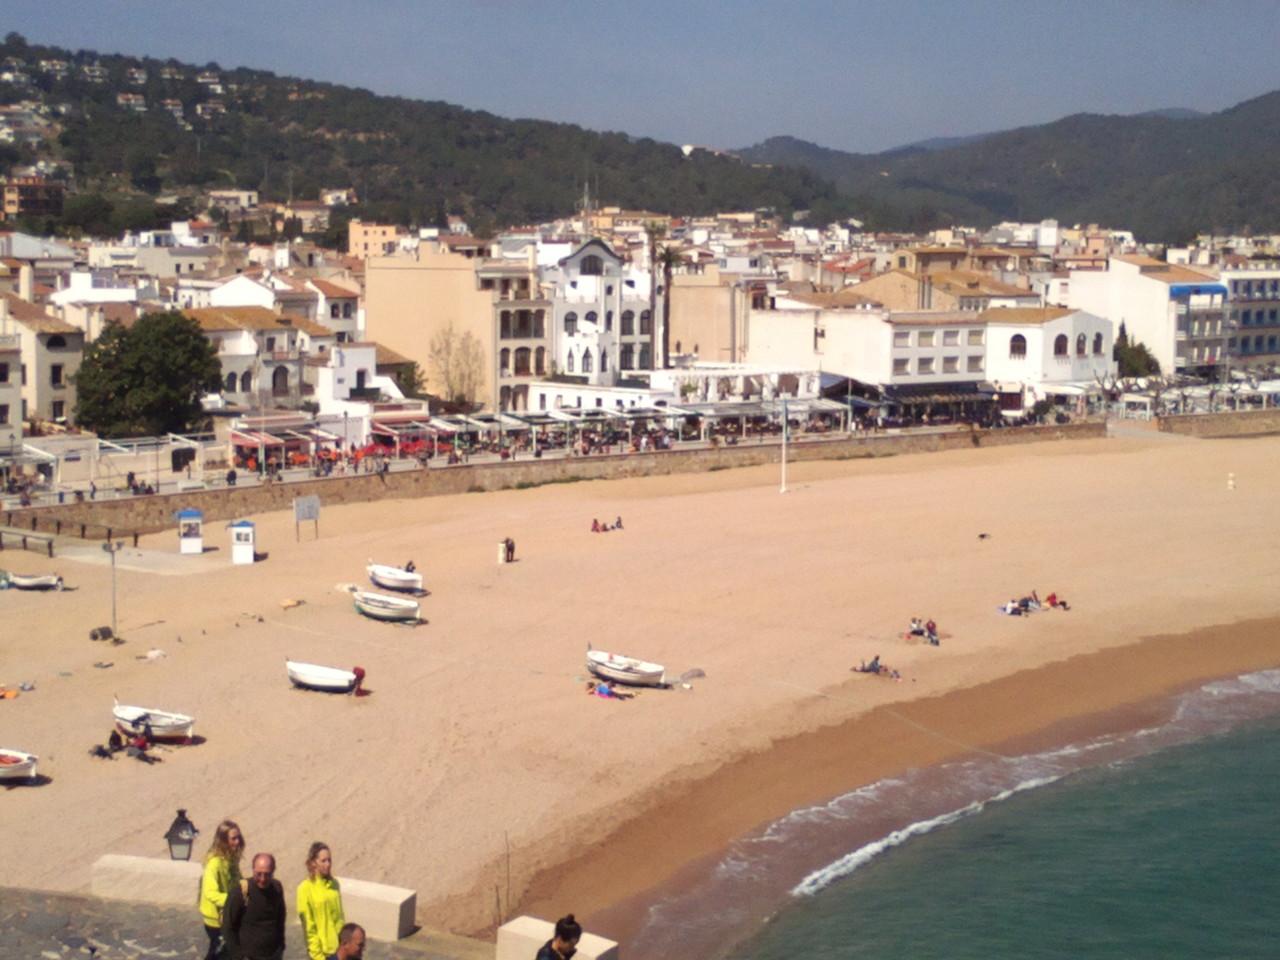 La plage de Tossa de Mar